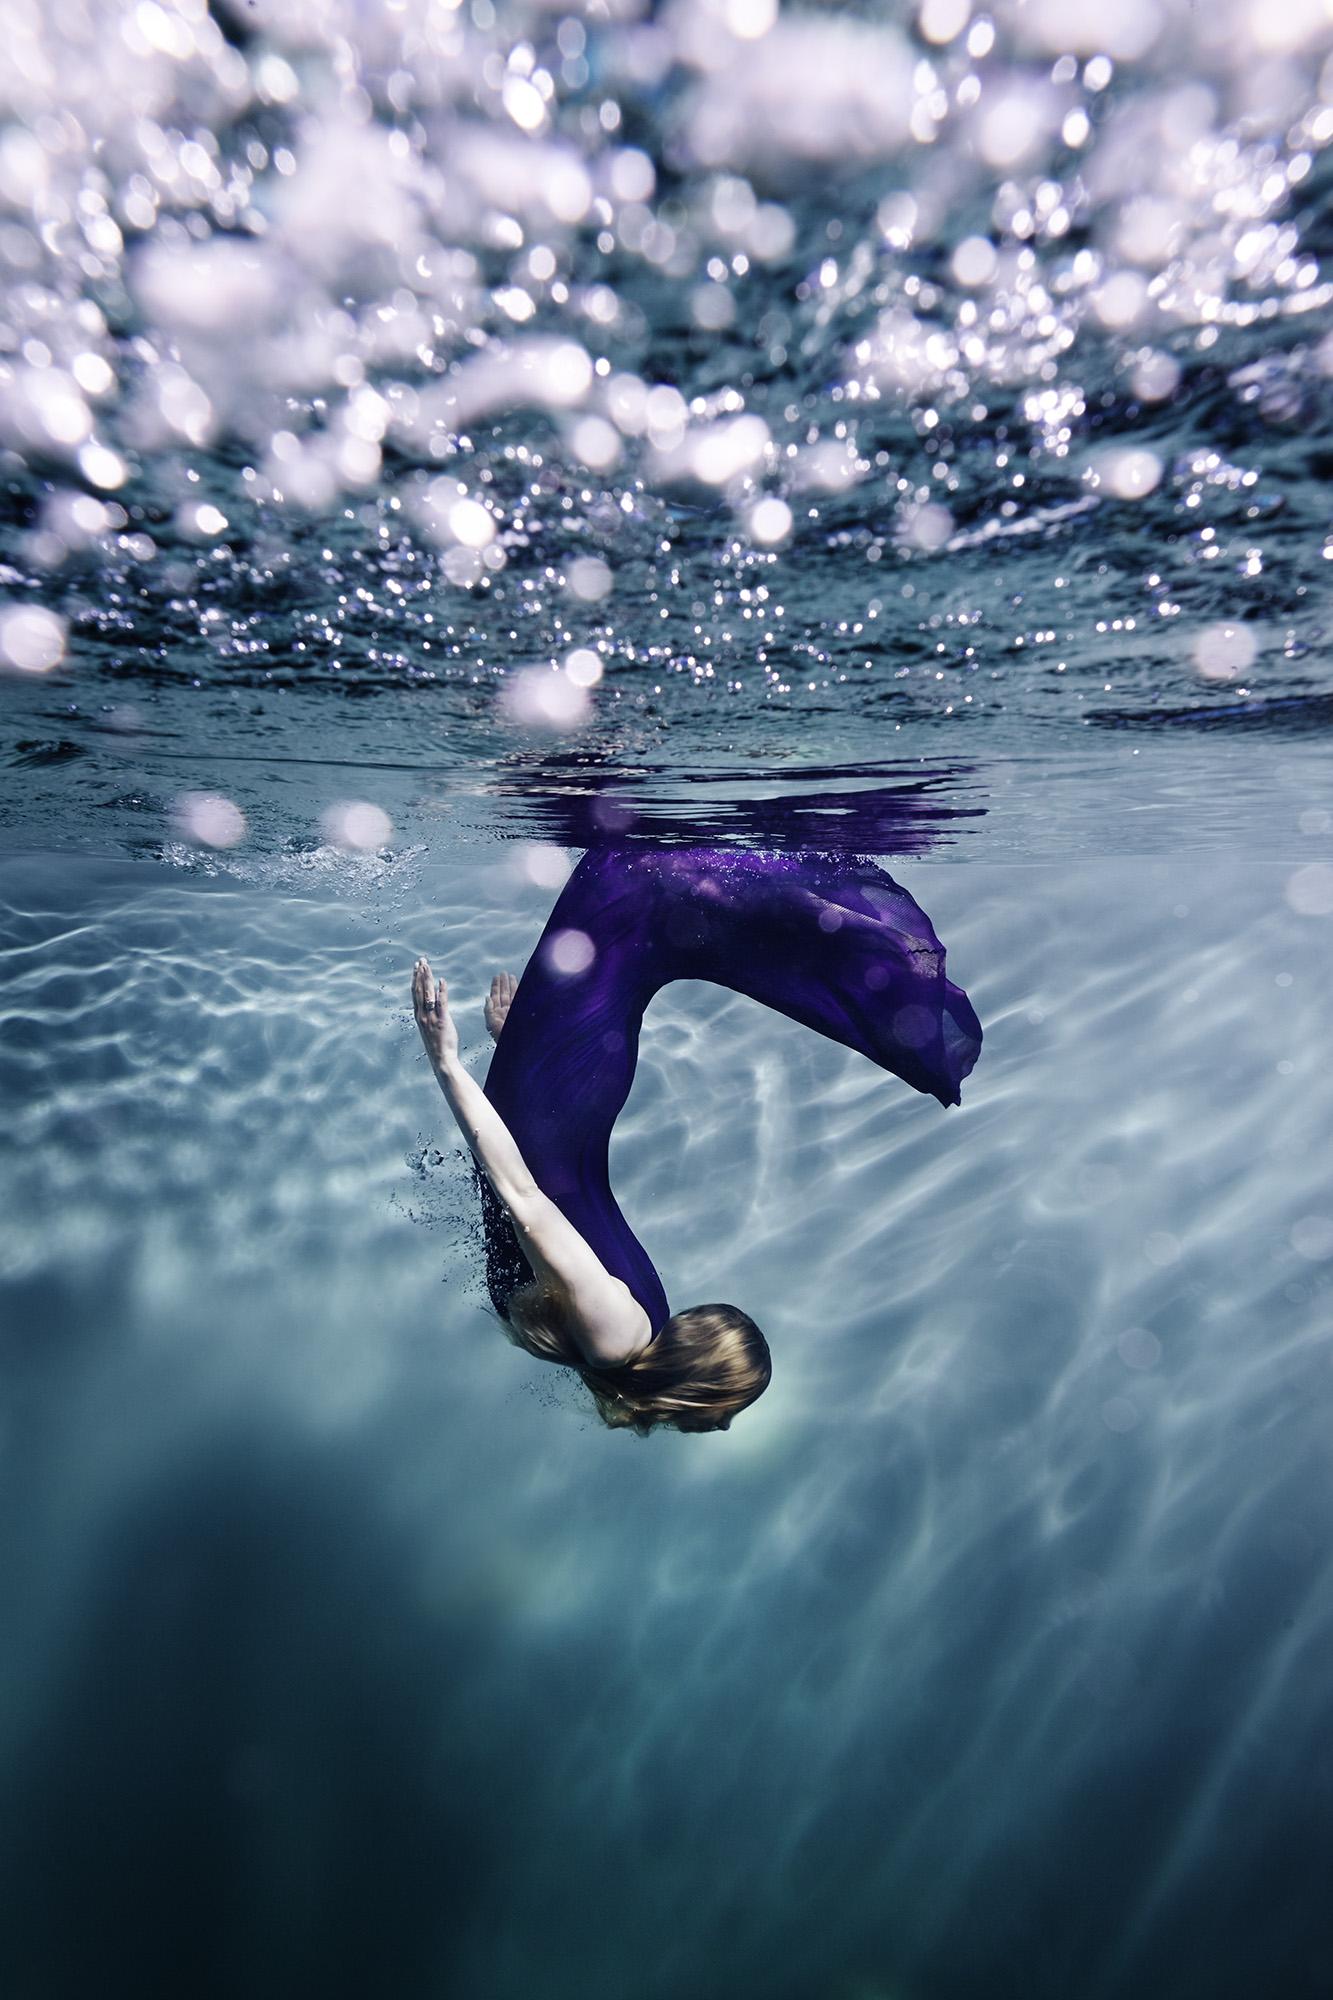 Susanne Stemmer girl doing flip in purple dress underwater